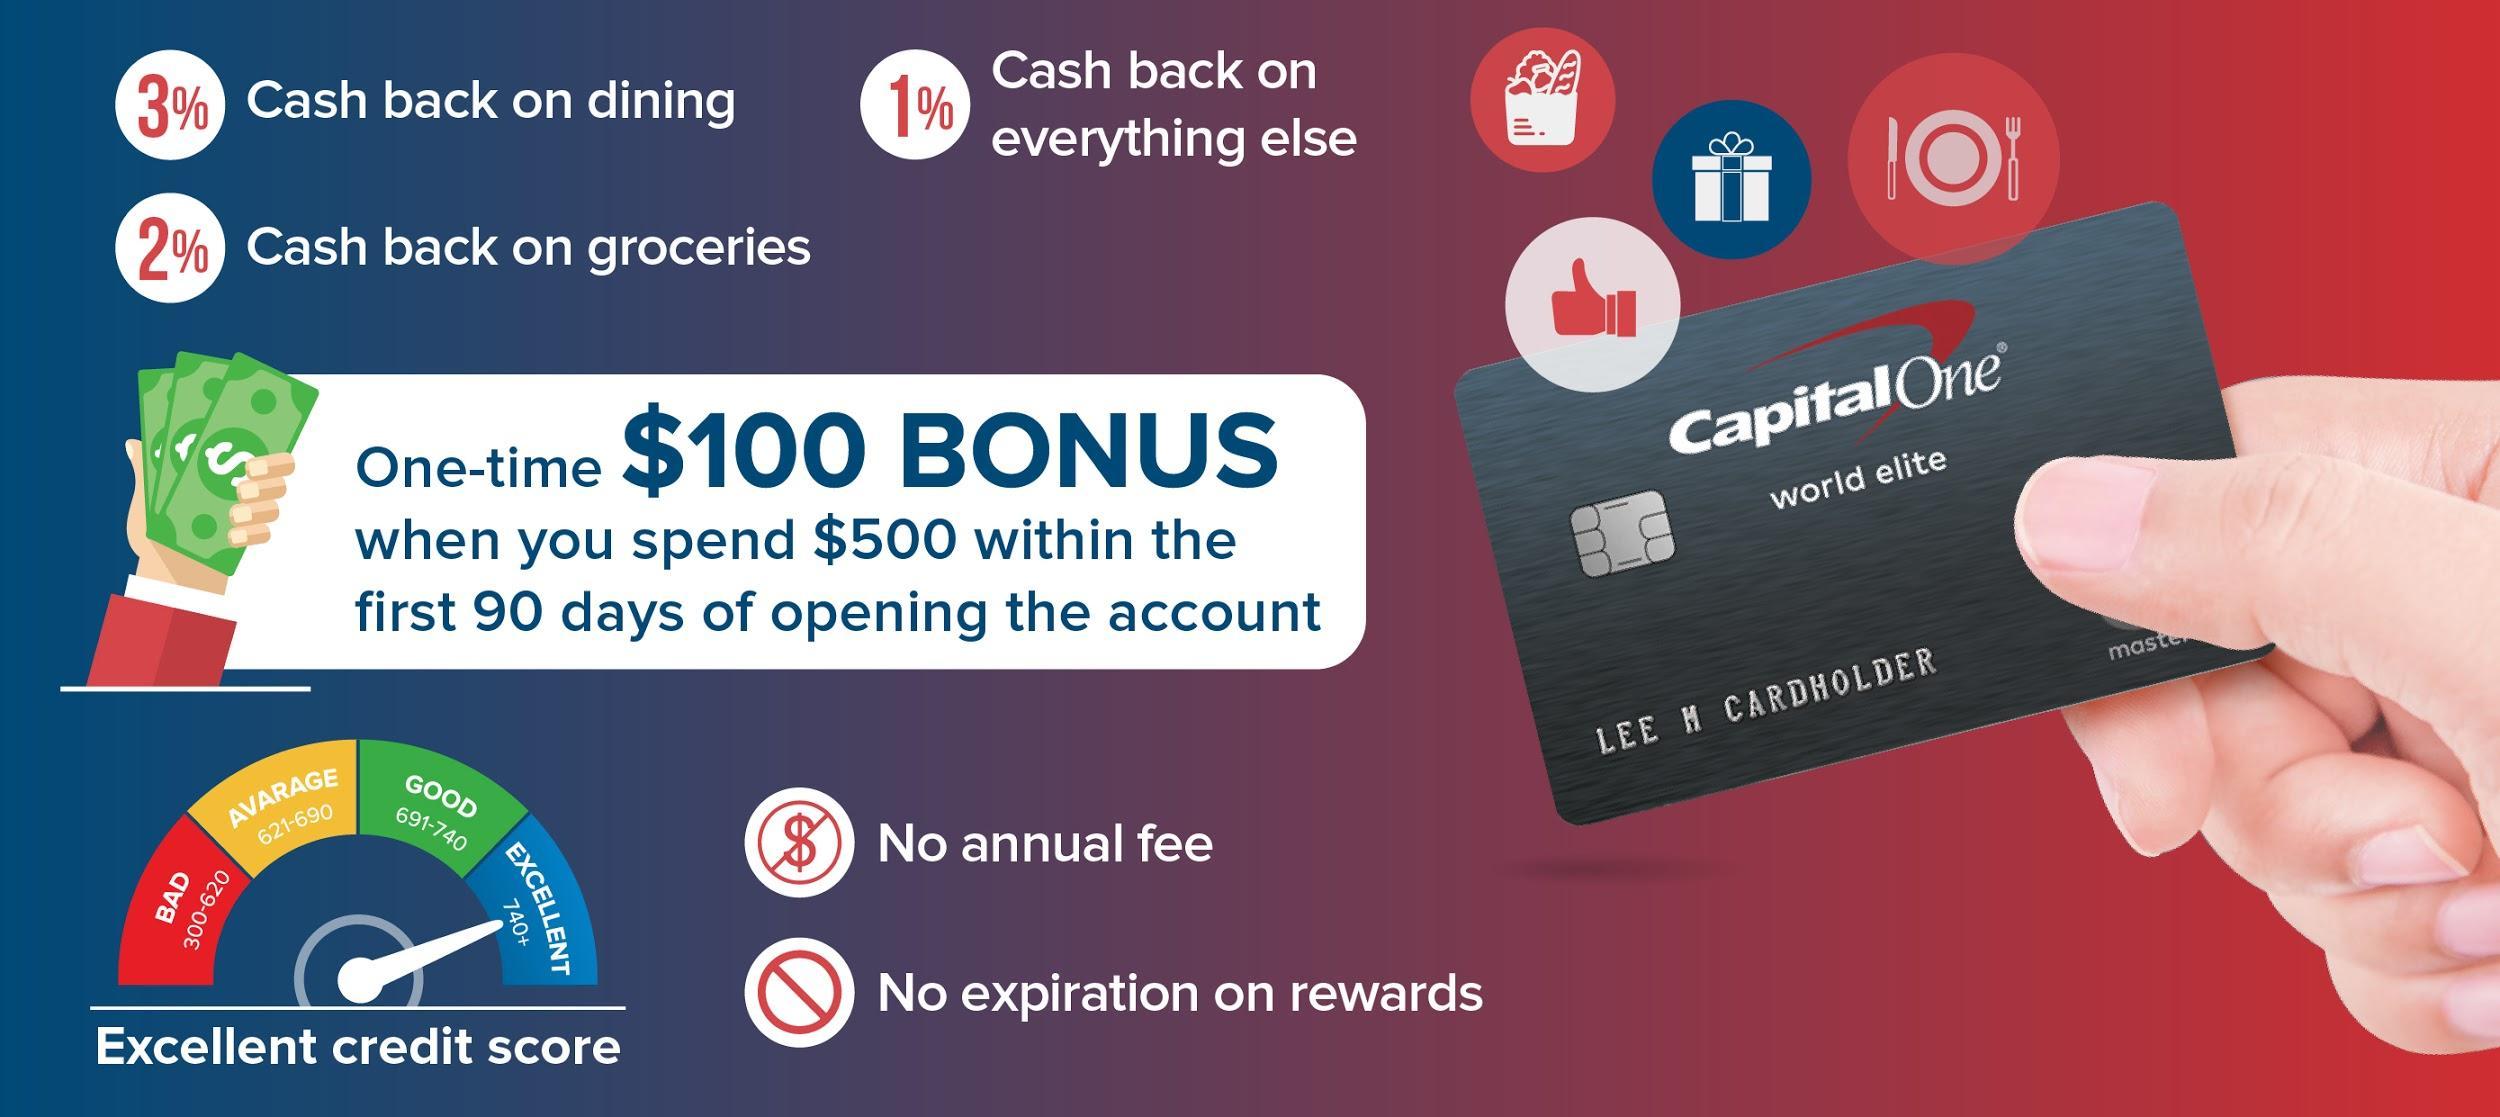 Capital One Cash Rewards Credit Cards - CreditLoan.com®